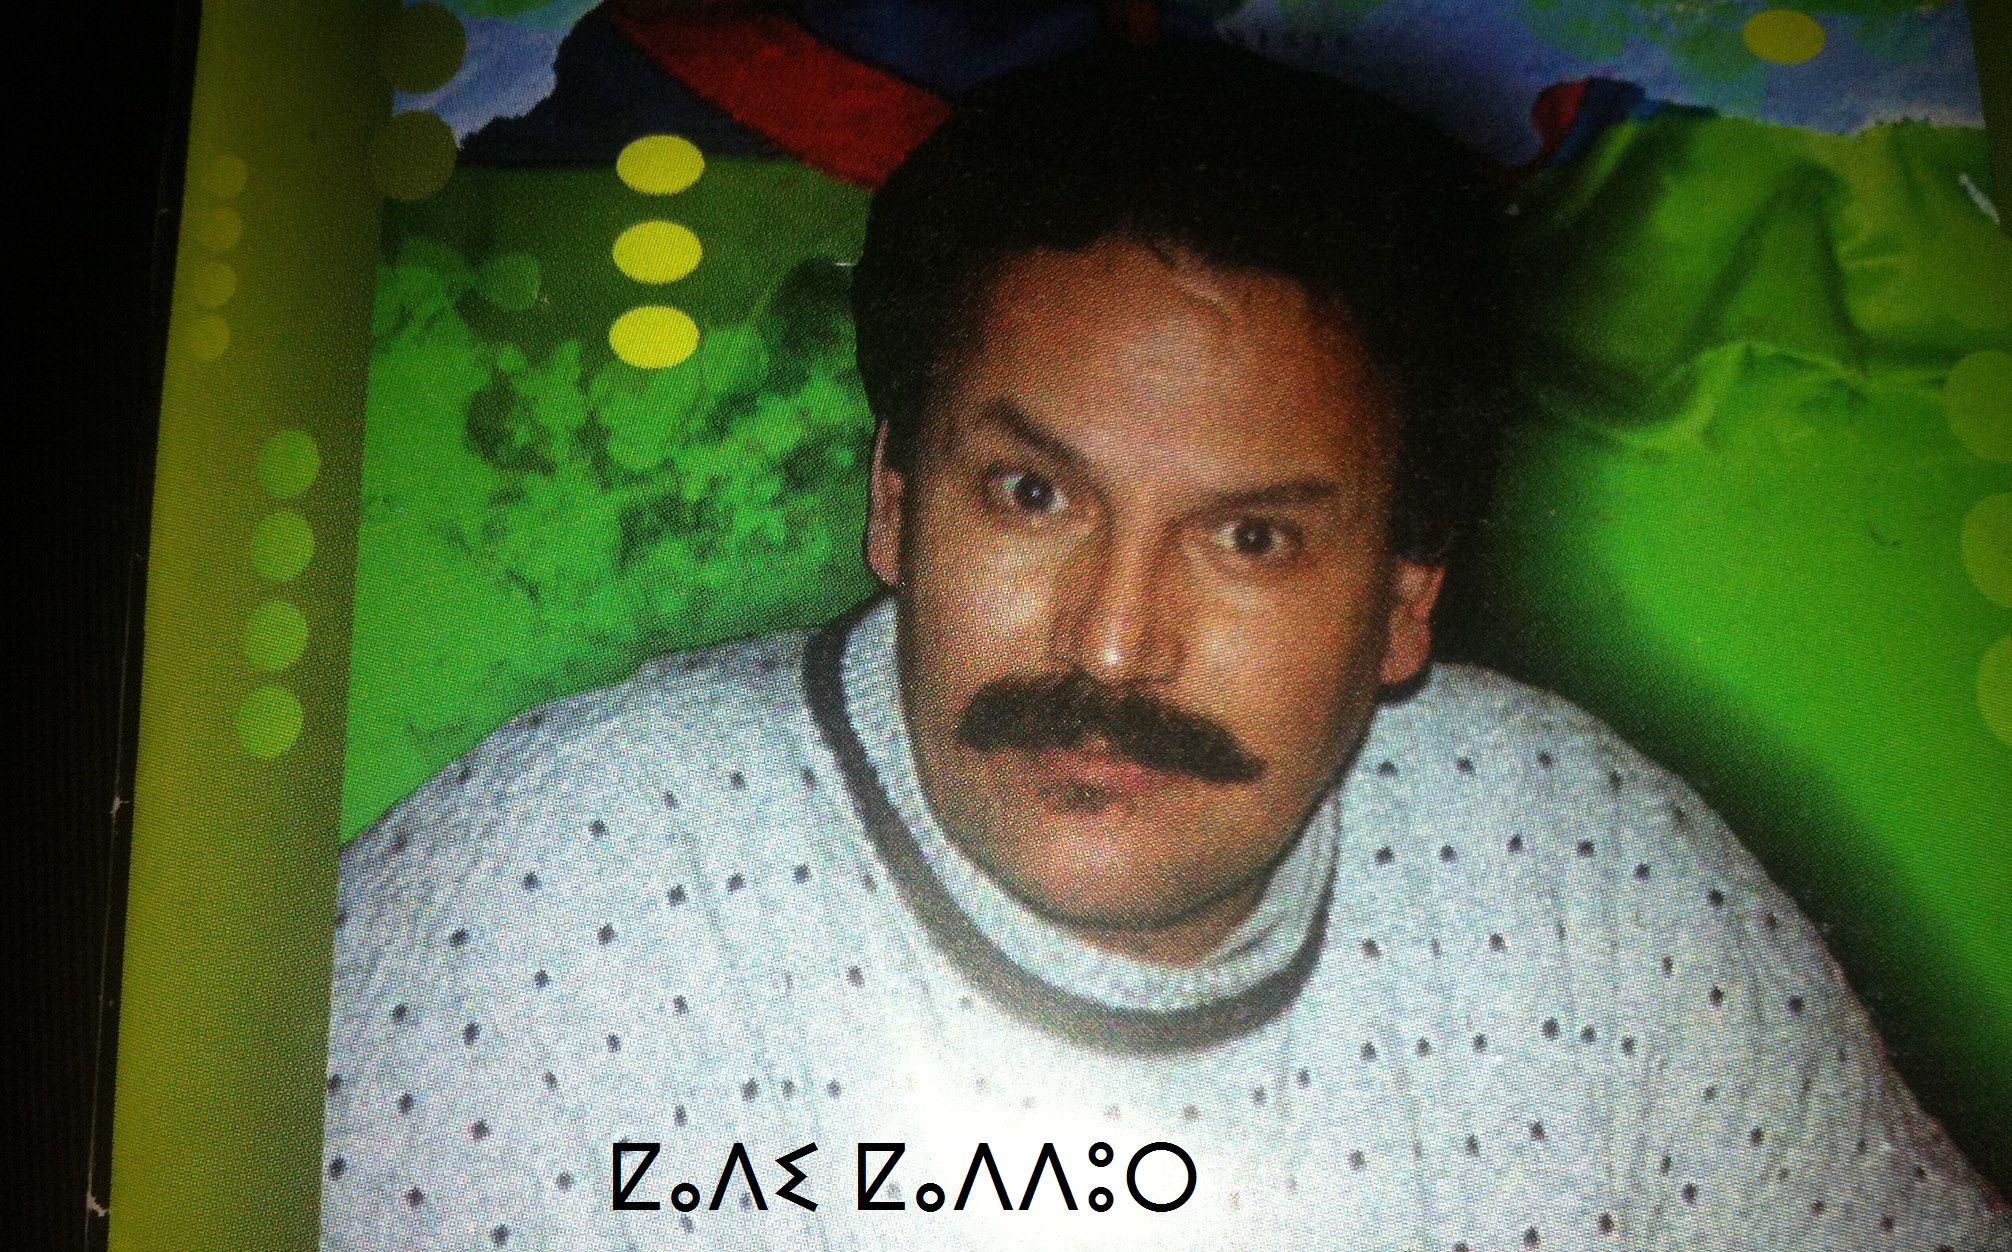 Lezing van Cadi Kaddour in Amsterdam 1994 over Tamazight